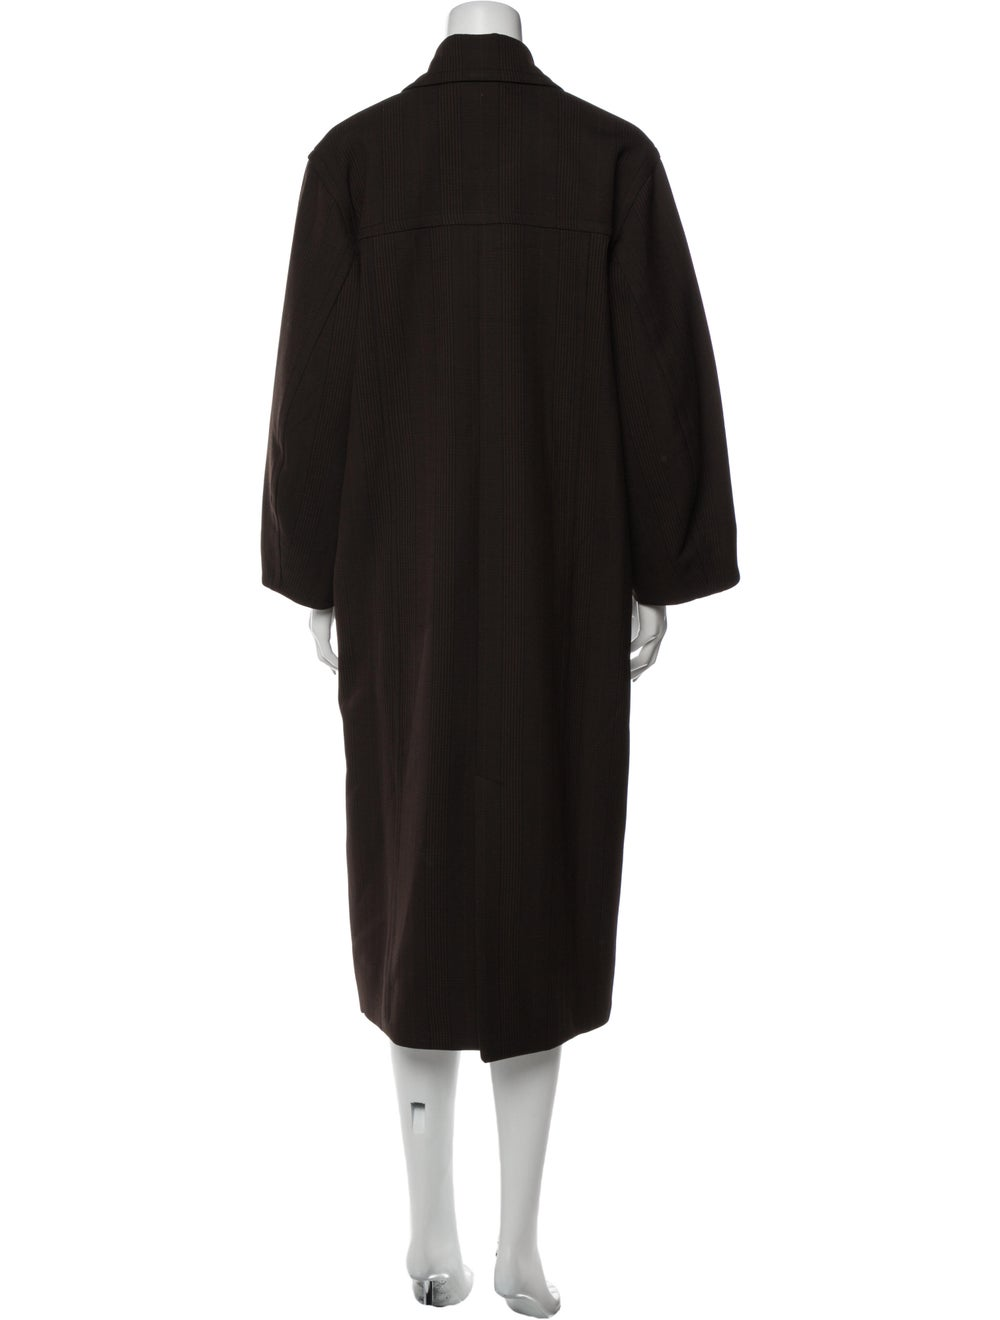 Ganni Coat Brown - image 3